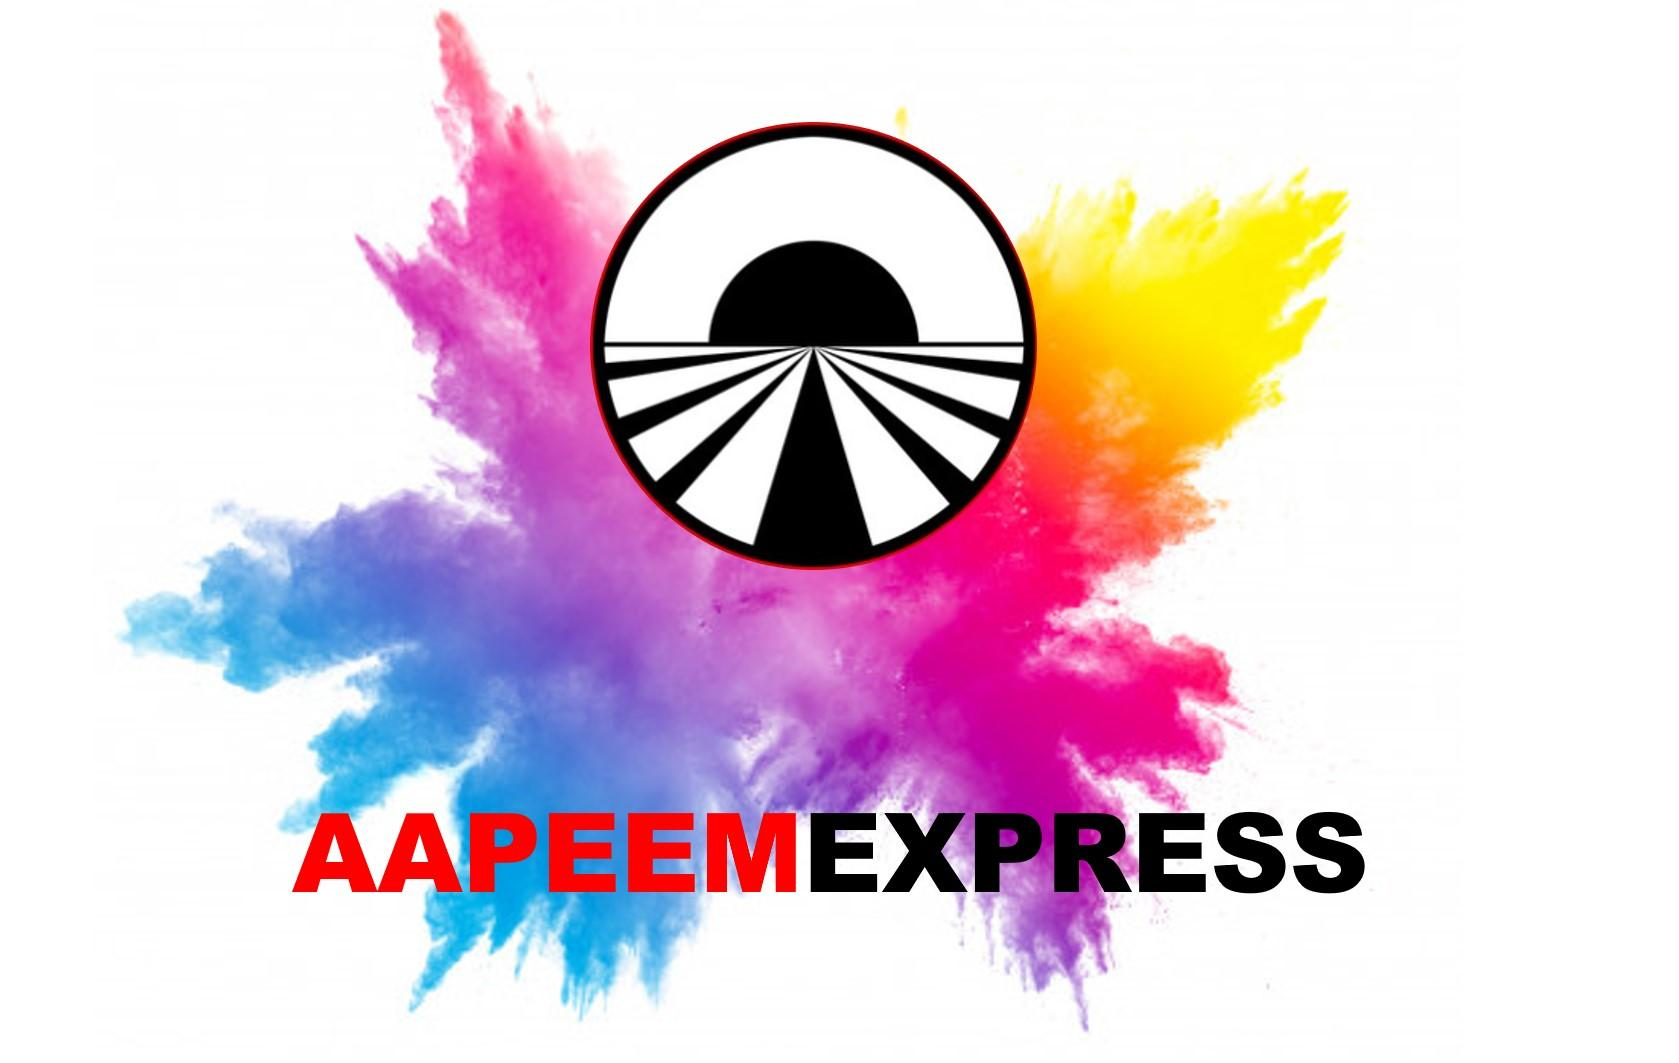 Drapeau aapeemexpress